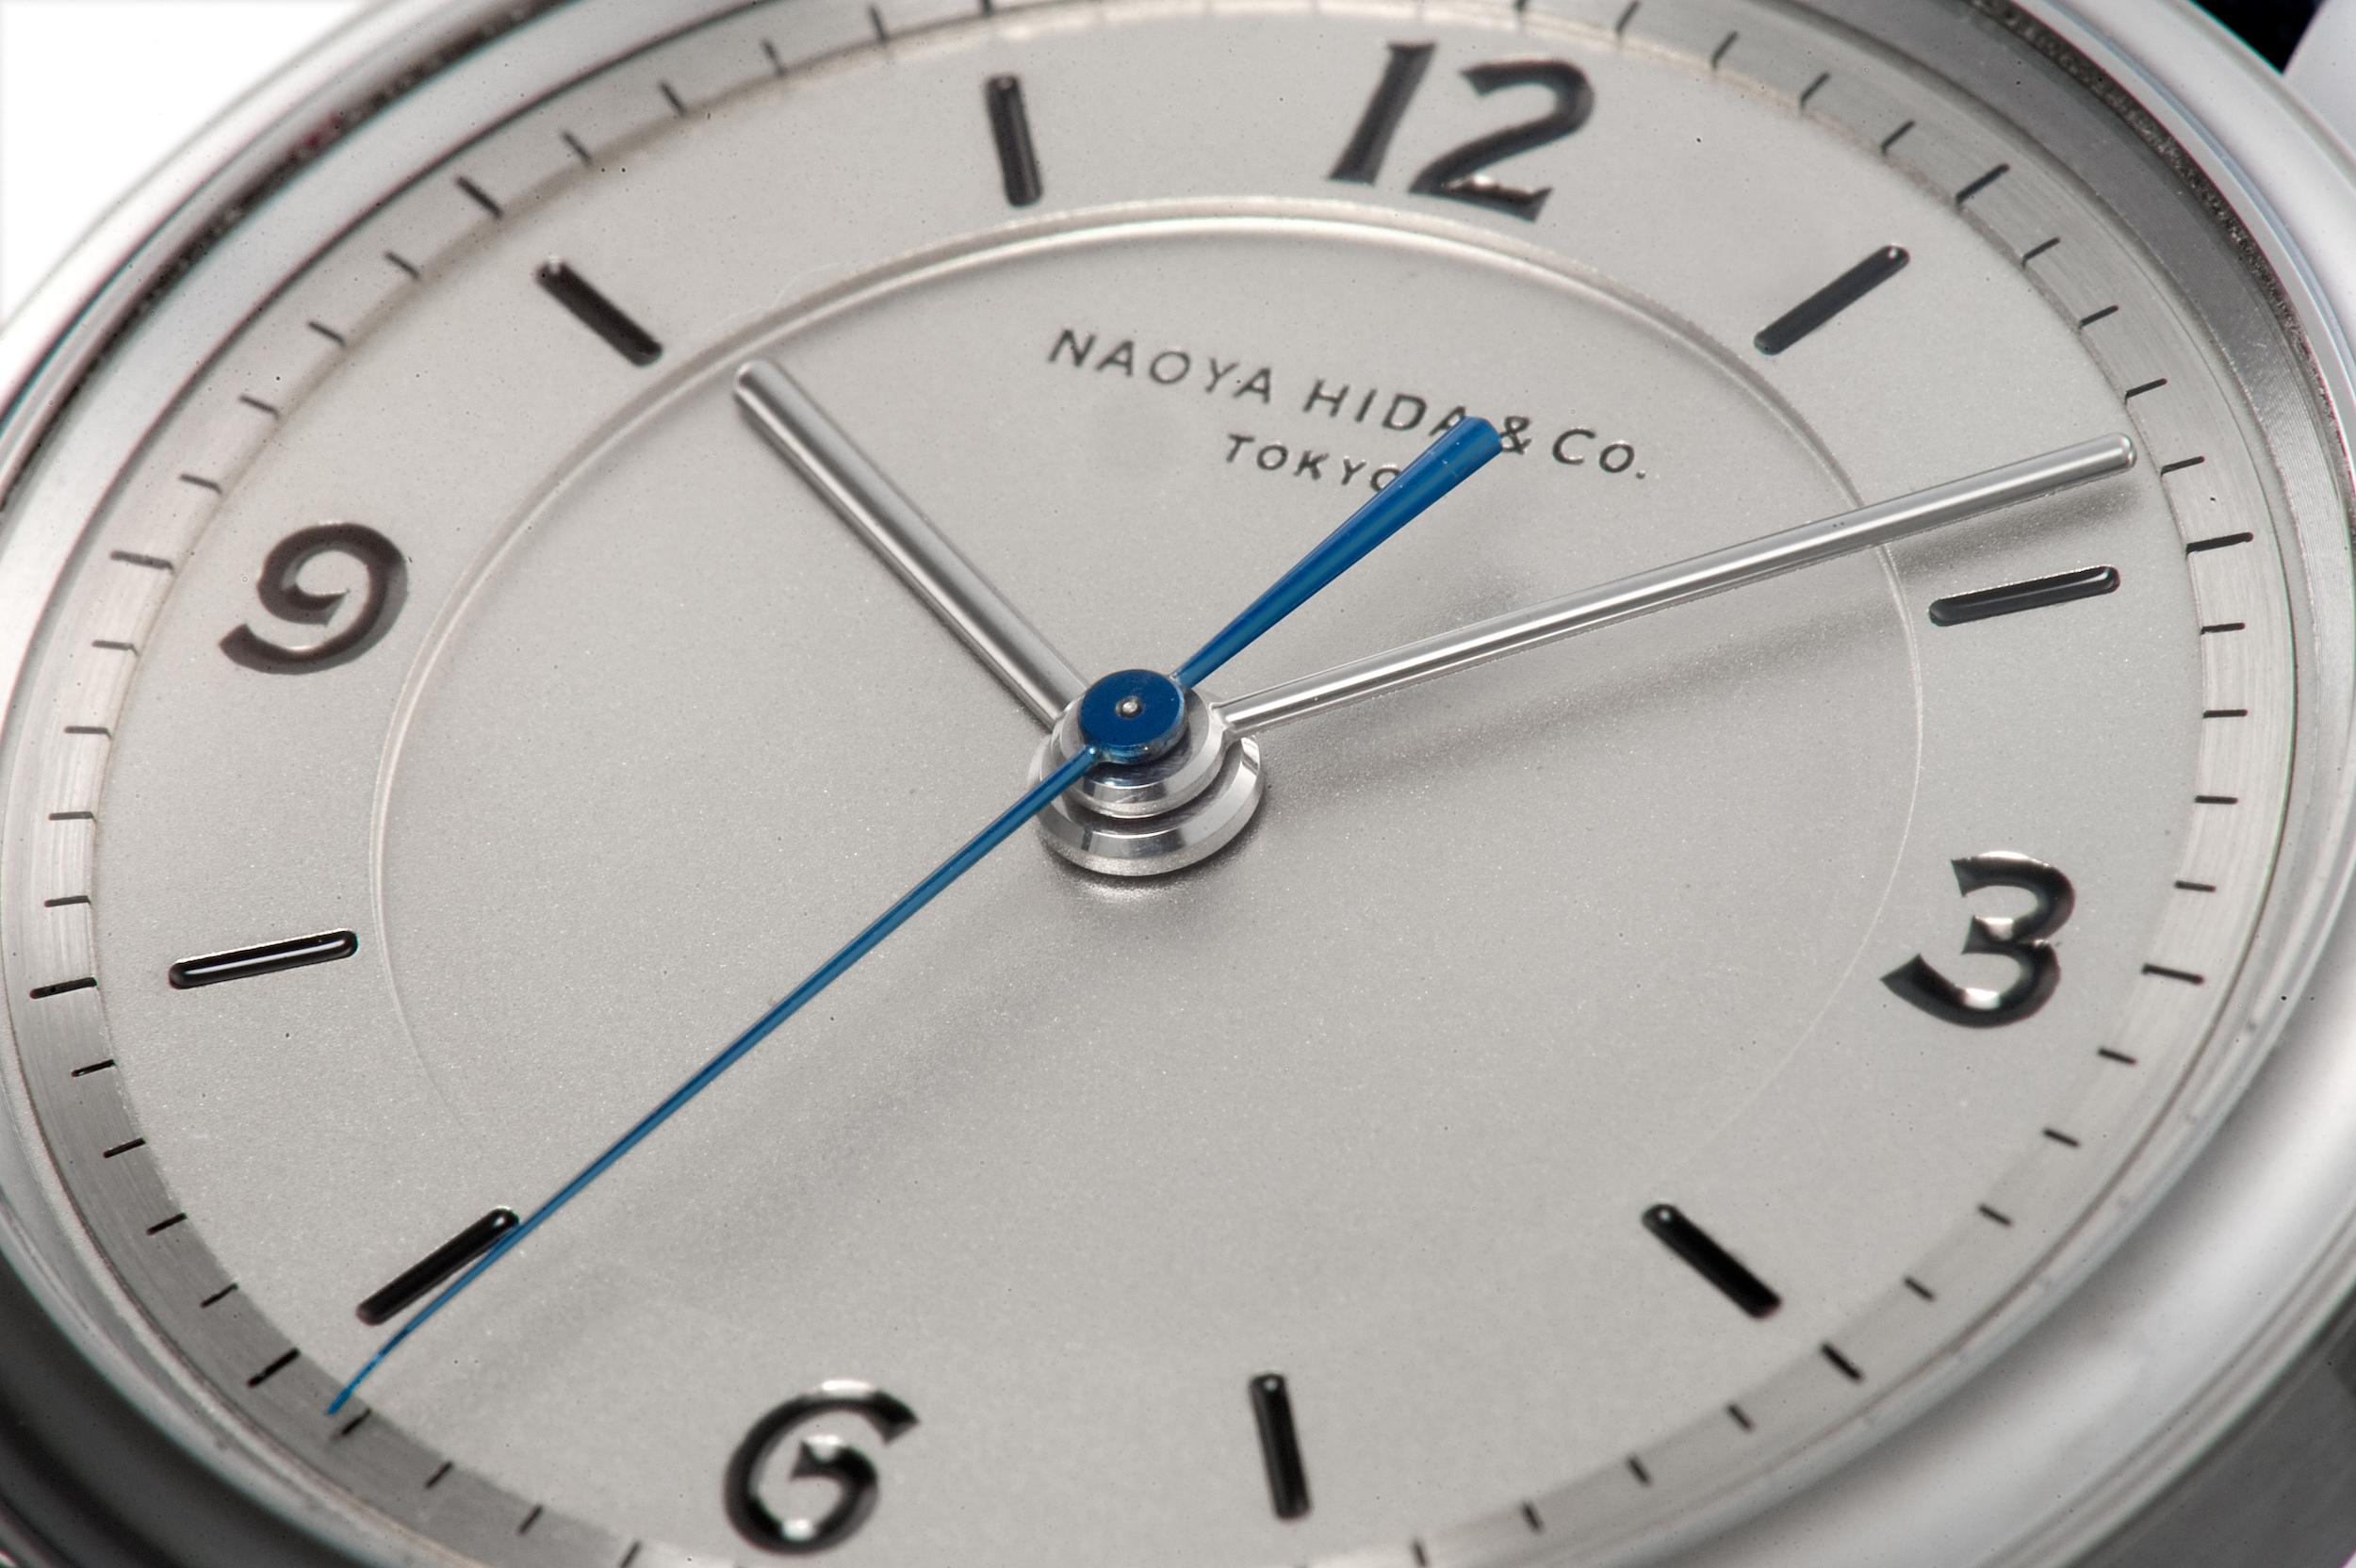 NAOYA HIDA watch dial